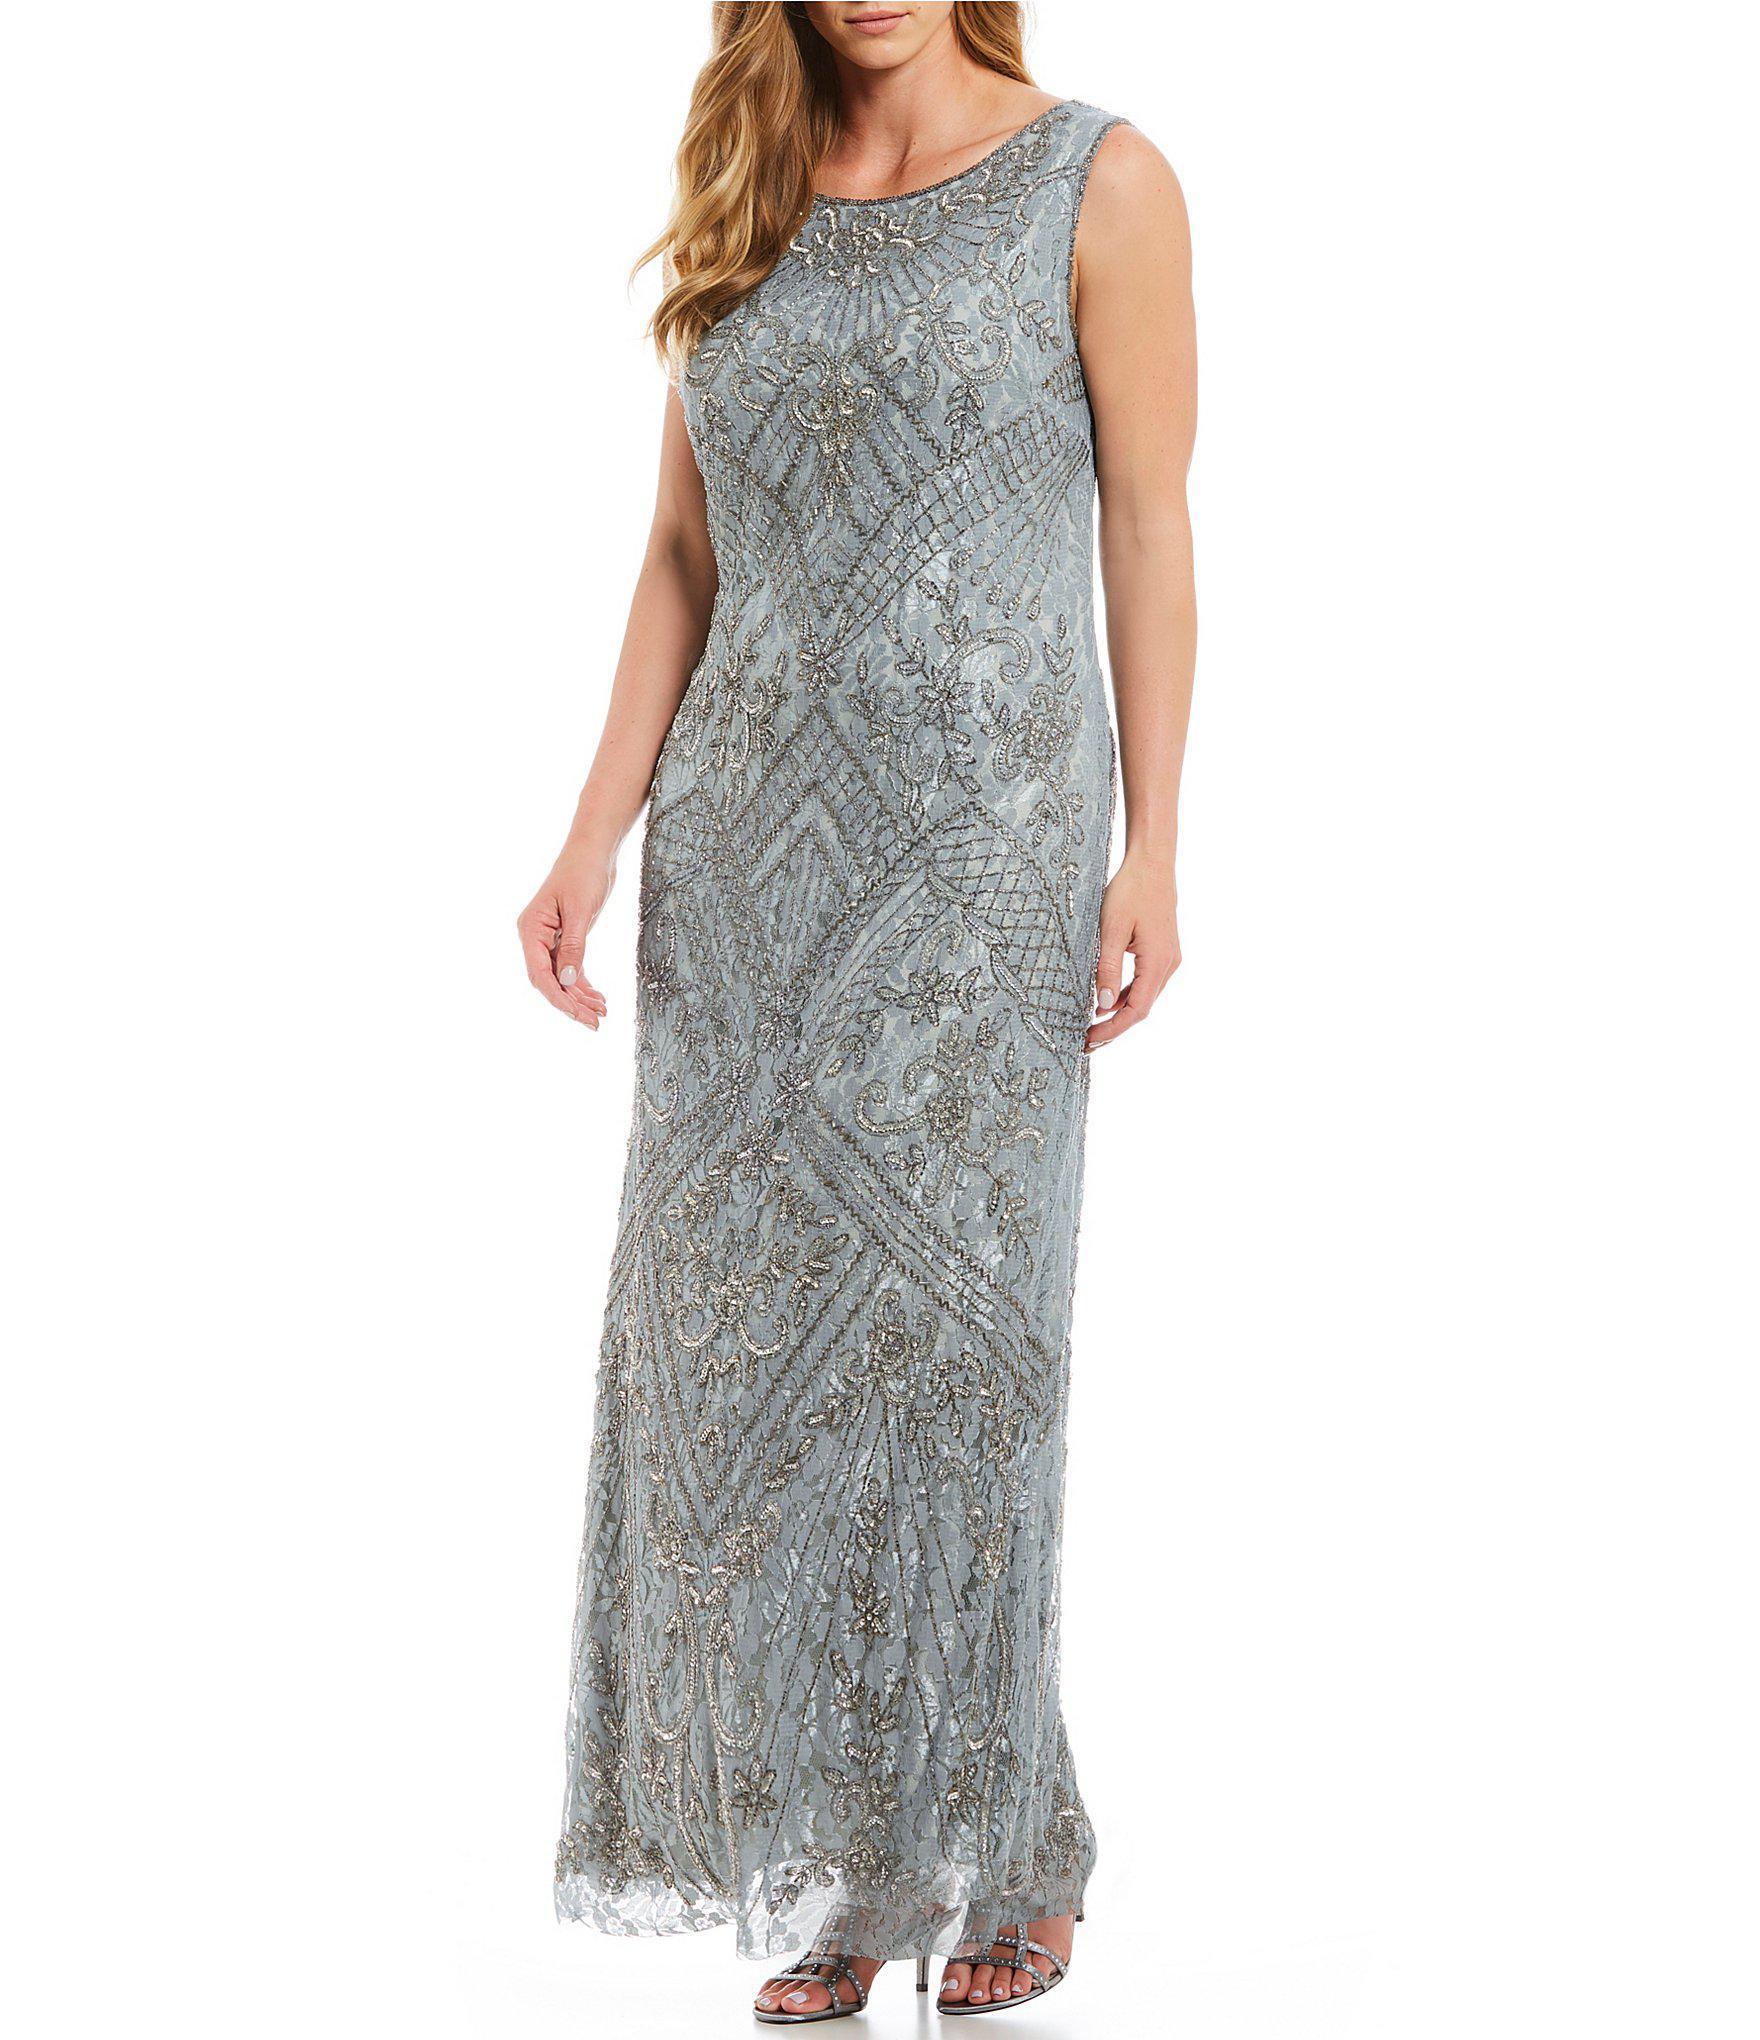 a9c6745f5b7 Lyst - Pisarro Nights Plus Size Sleeveless Beaded Lace Gown in Metallic